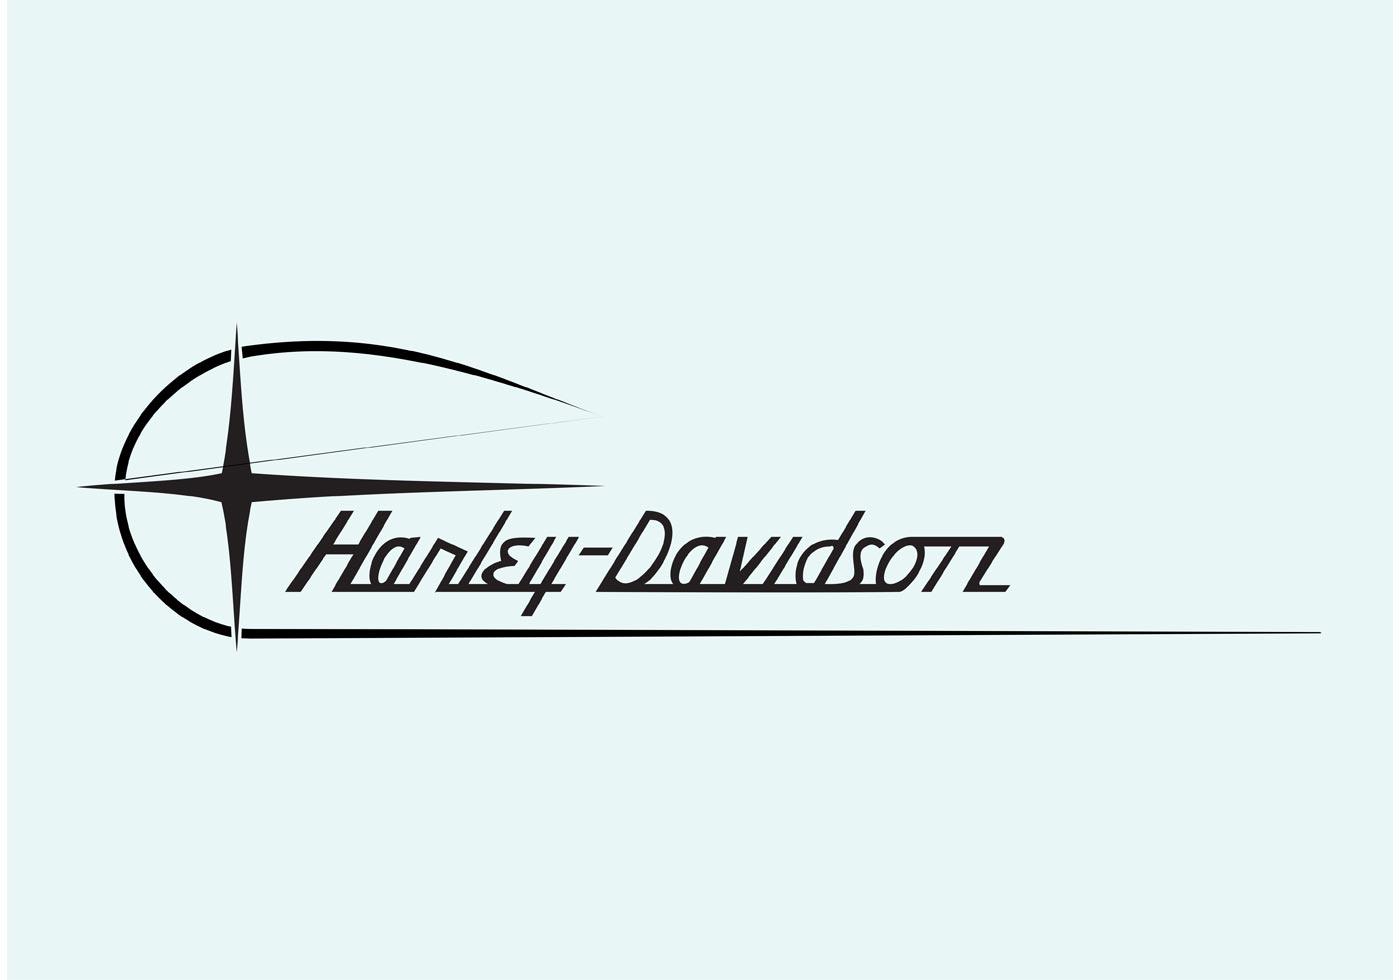 Harley Davidson Logo - Download Free Vectors, Clipart ...